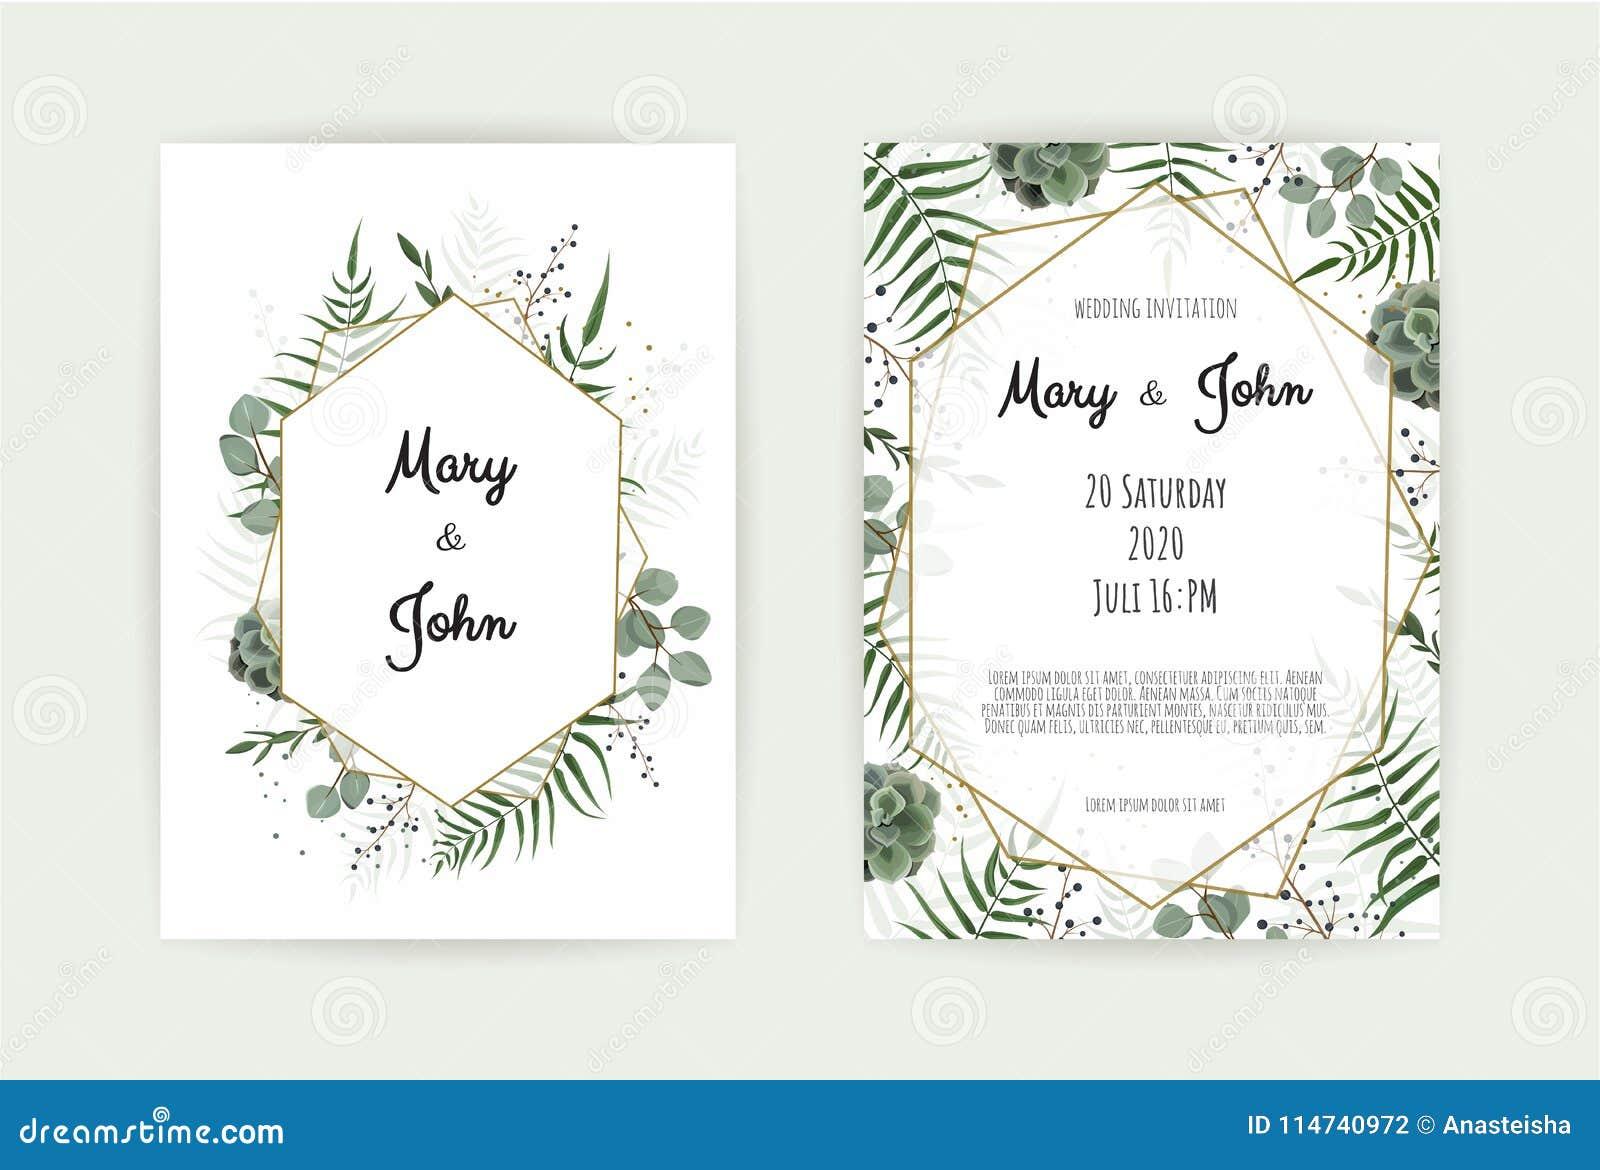 Natural Botanical Wedding Invitation Template. Vector Floral